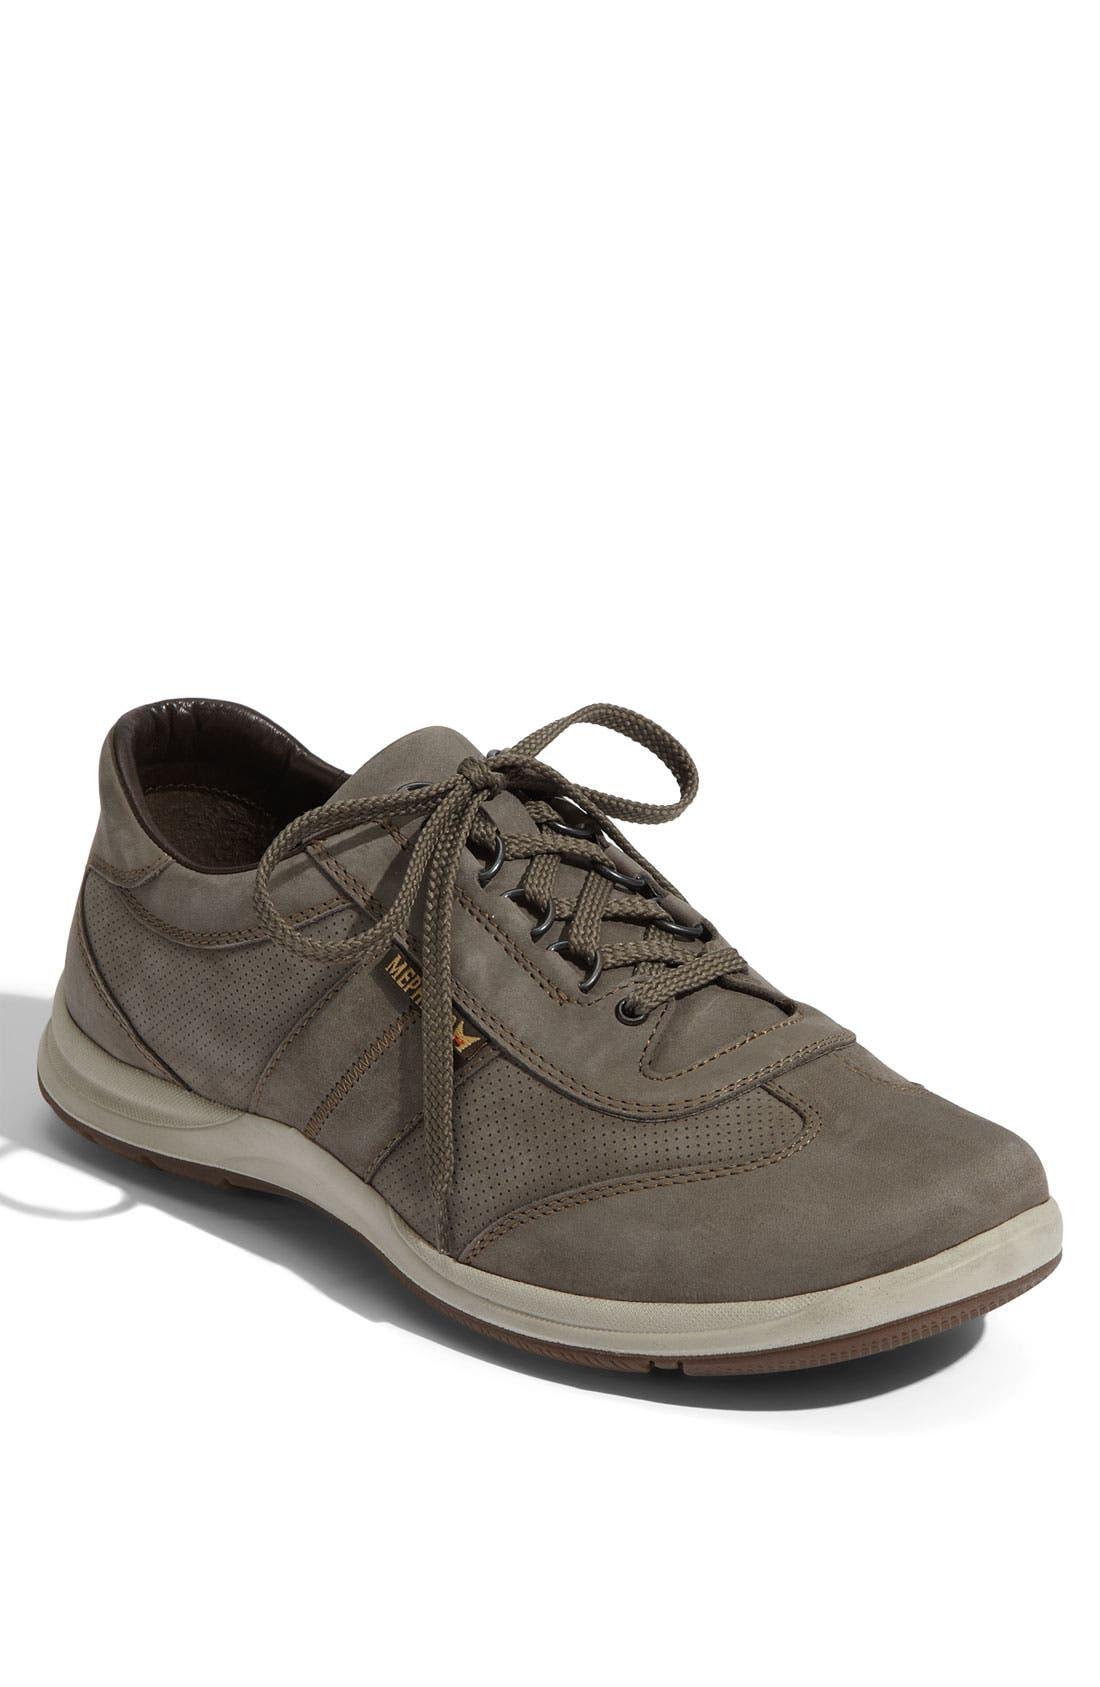 Alternate Image 1 Selected - Mephisto 'Hike' Perforated Walking Shoe (Men)